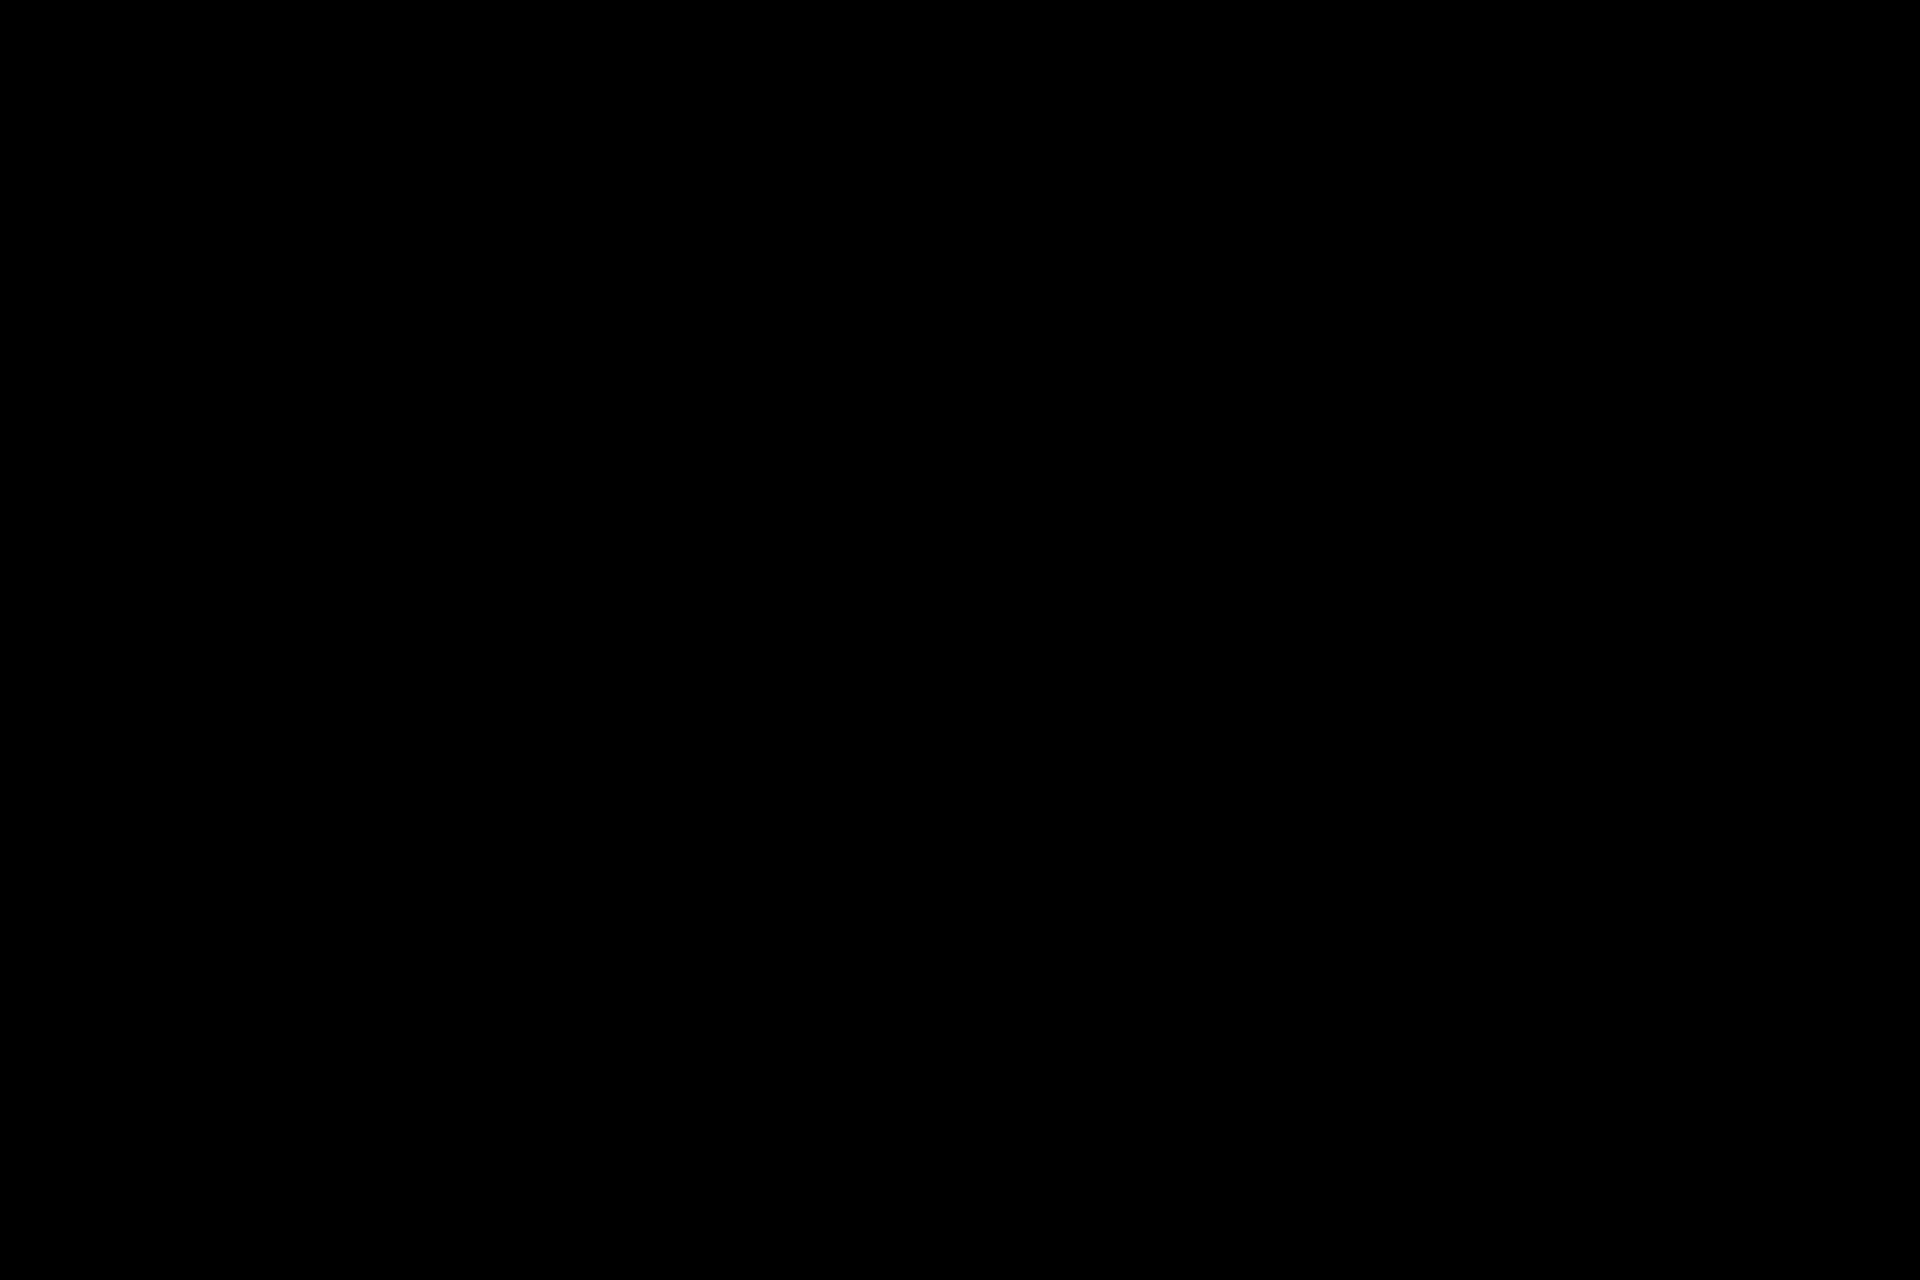 Sommerhöck 2019